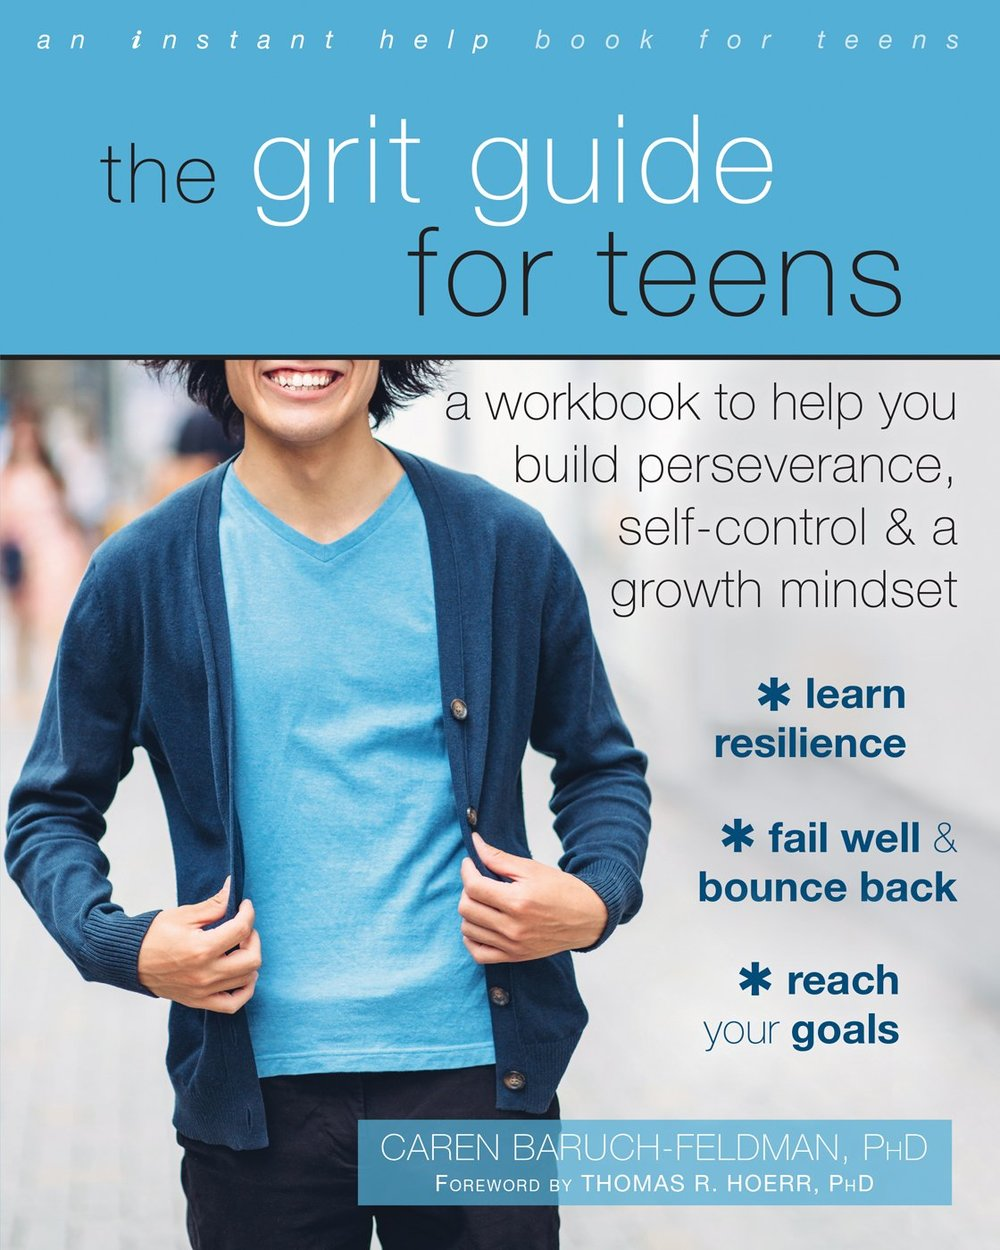 The Grit Guide for Teens_Angela Duckworth.jpg